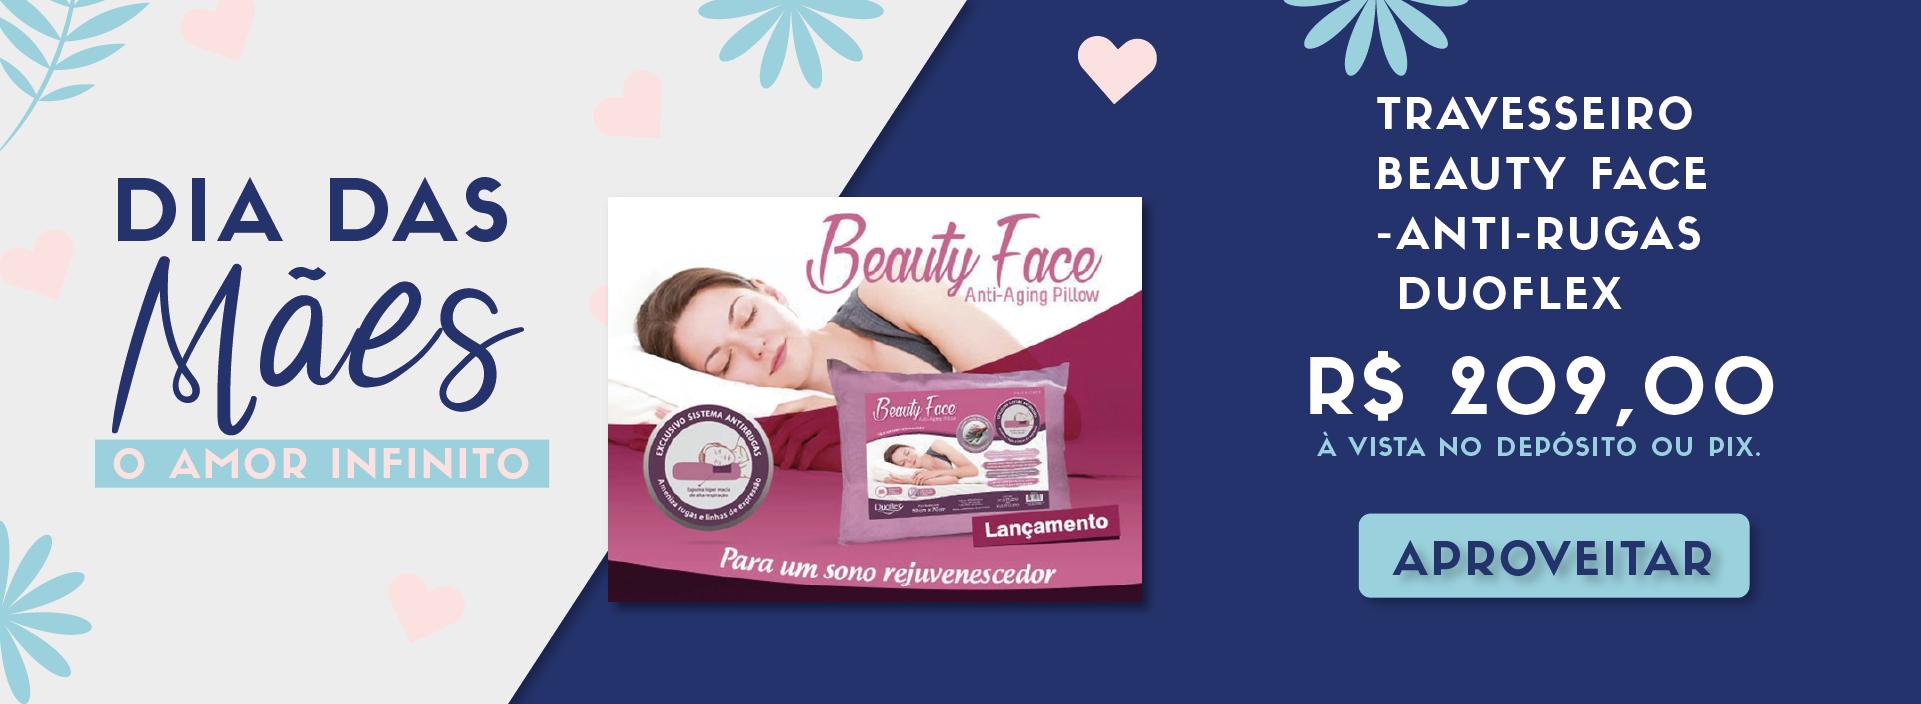 [MÃES] Travesseiro Beauty MOB